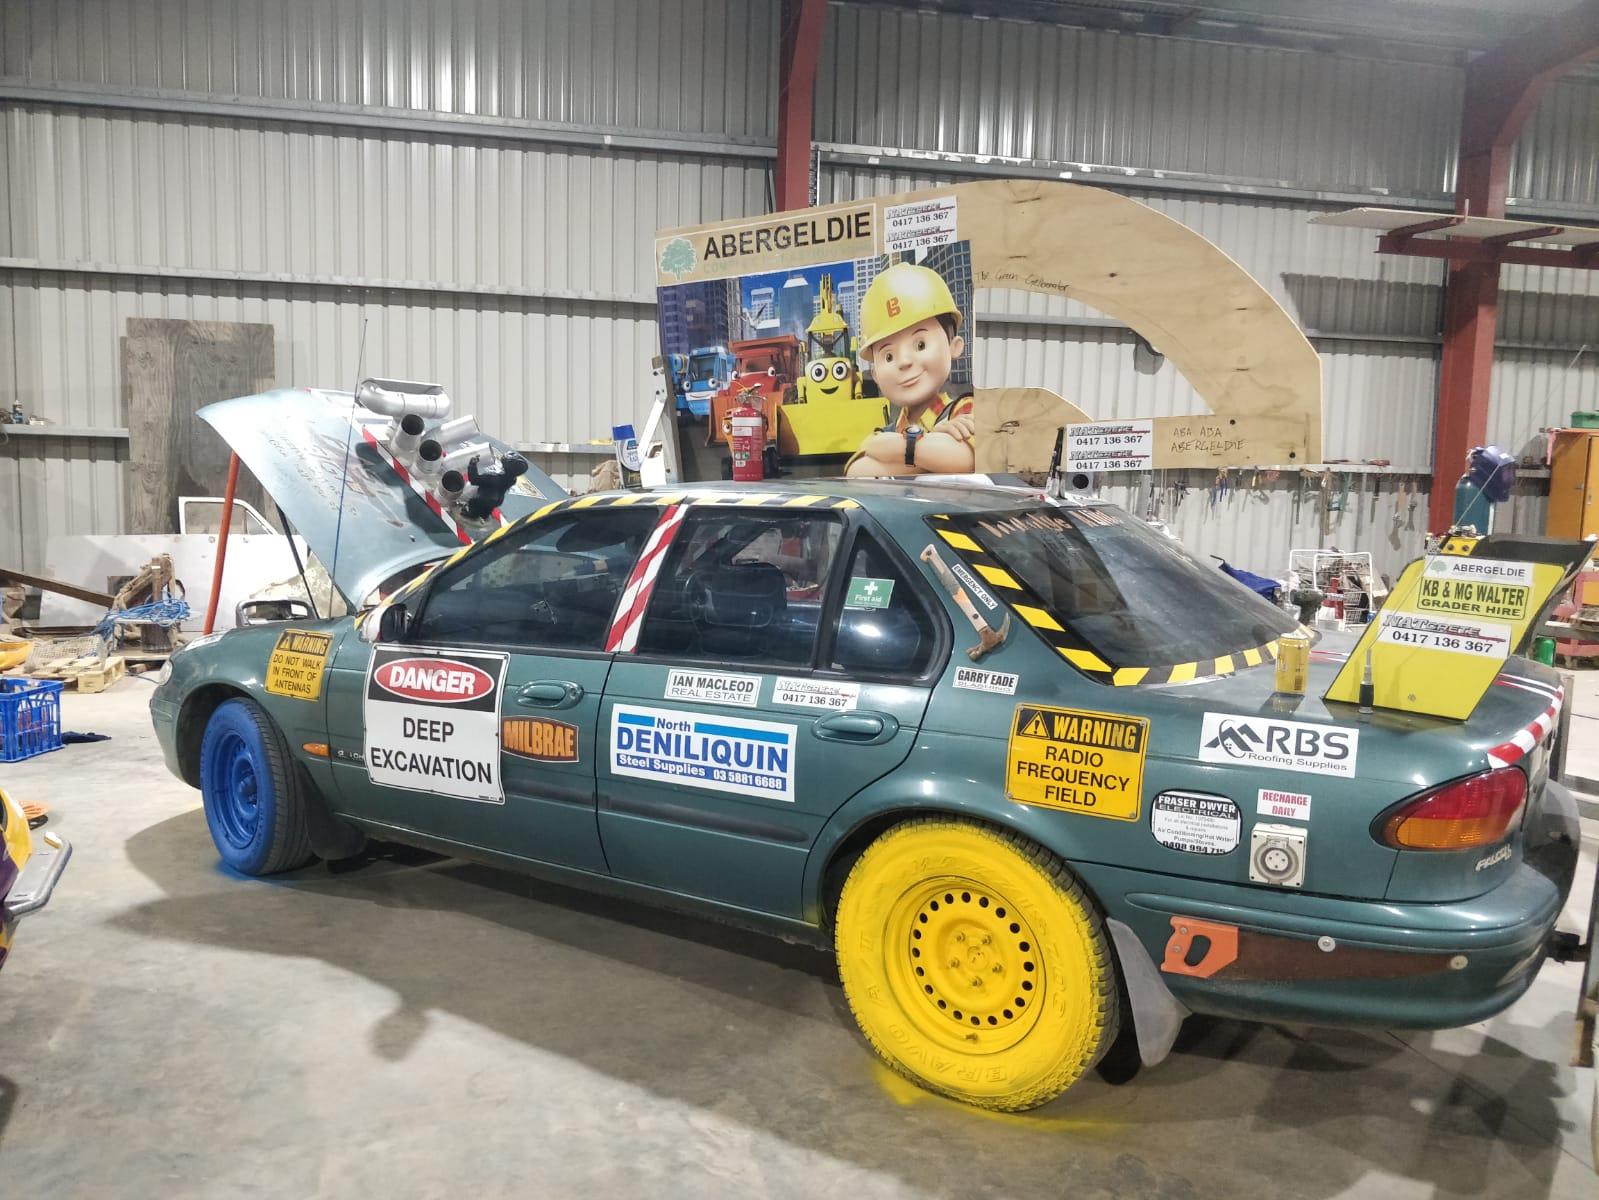 The Abergeldie Rally car ready